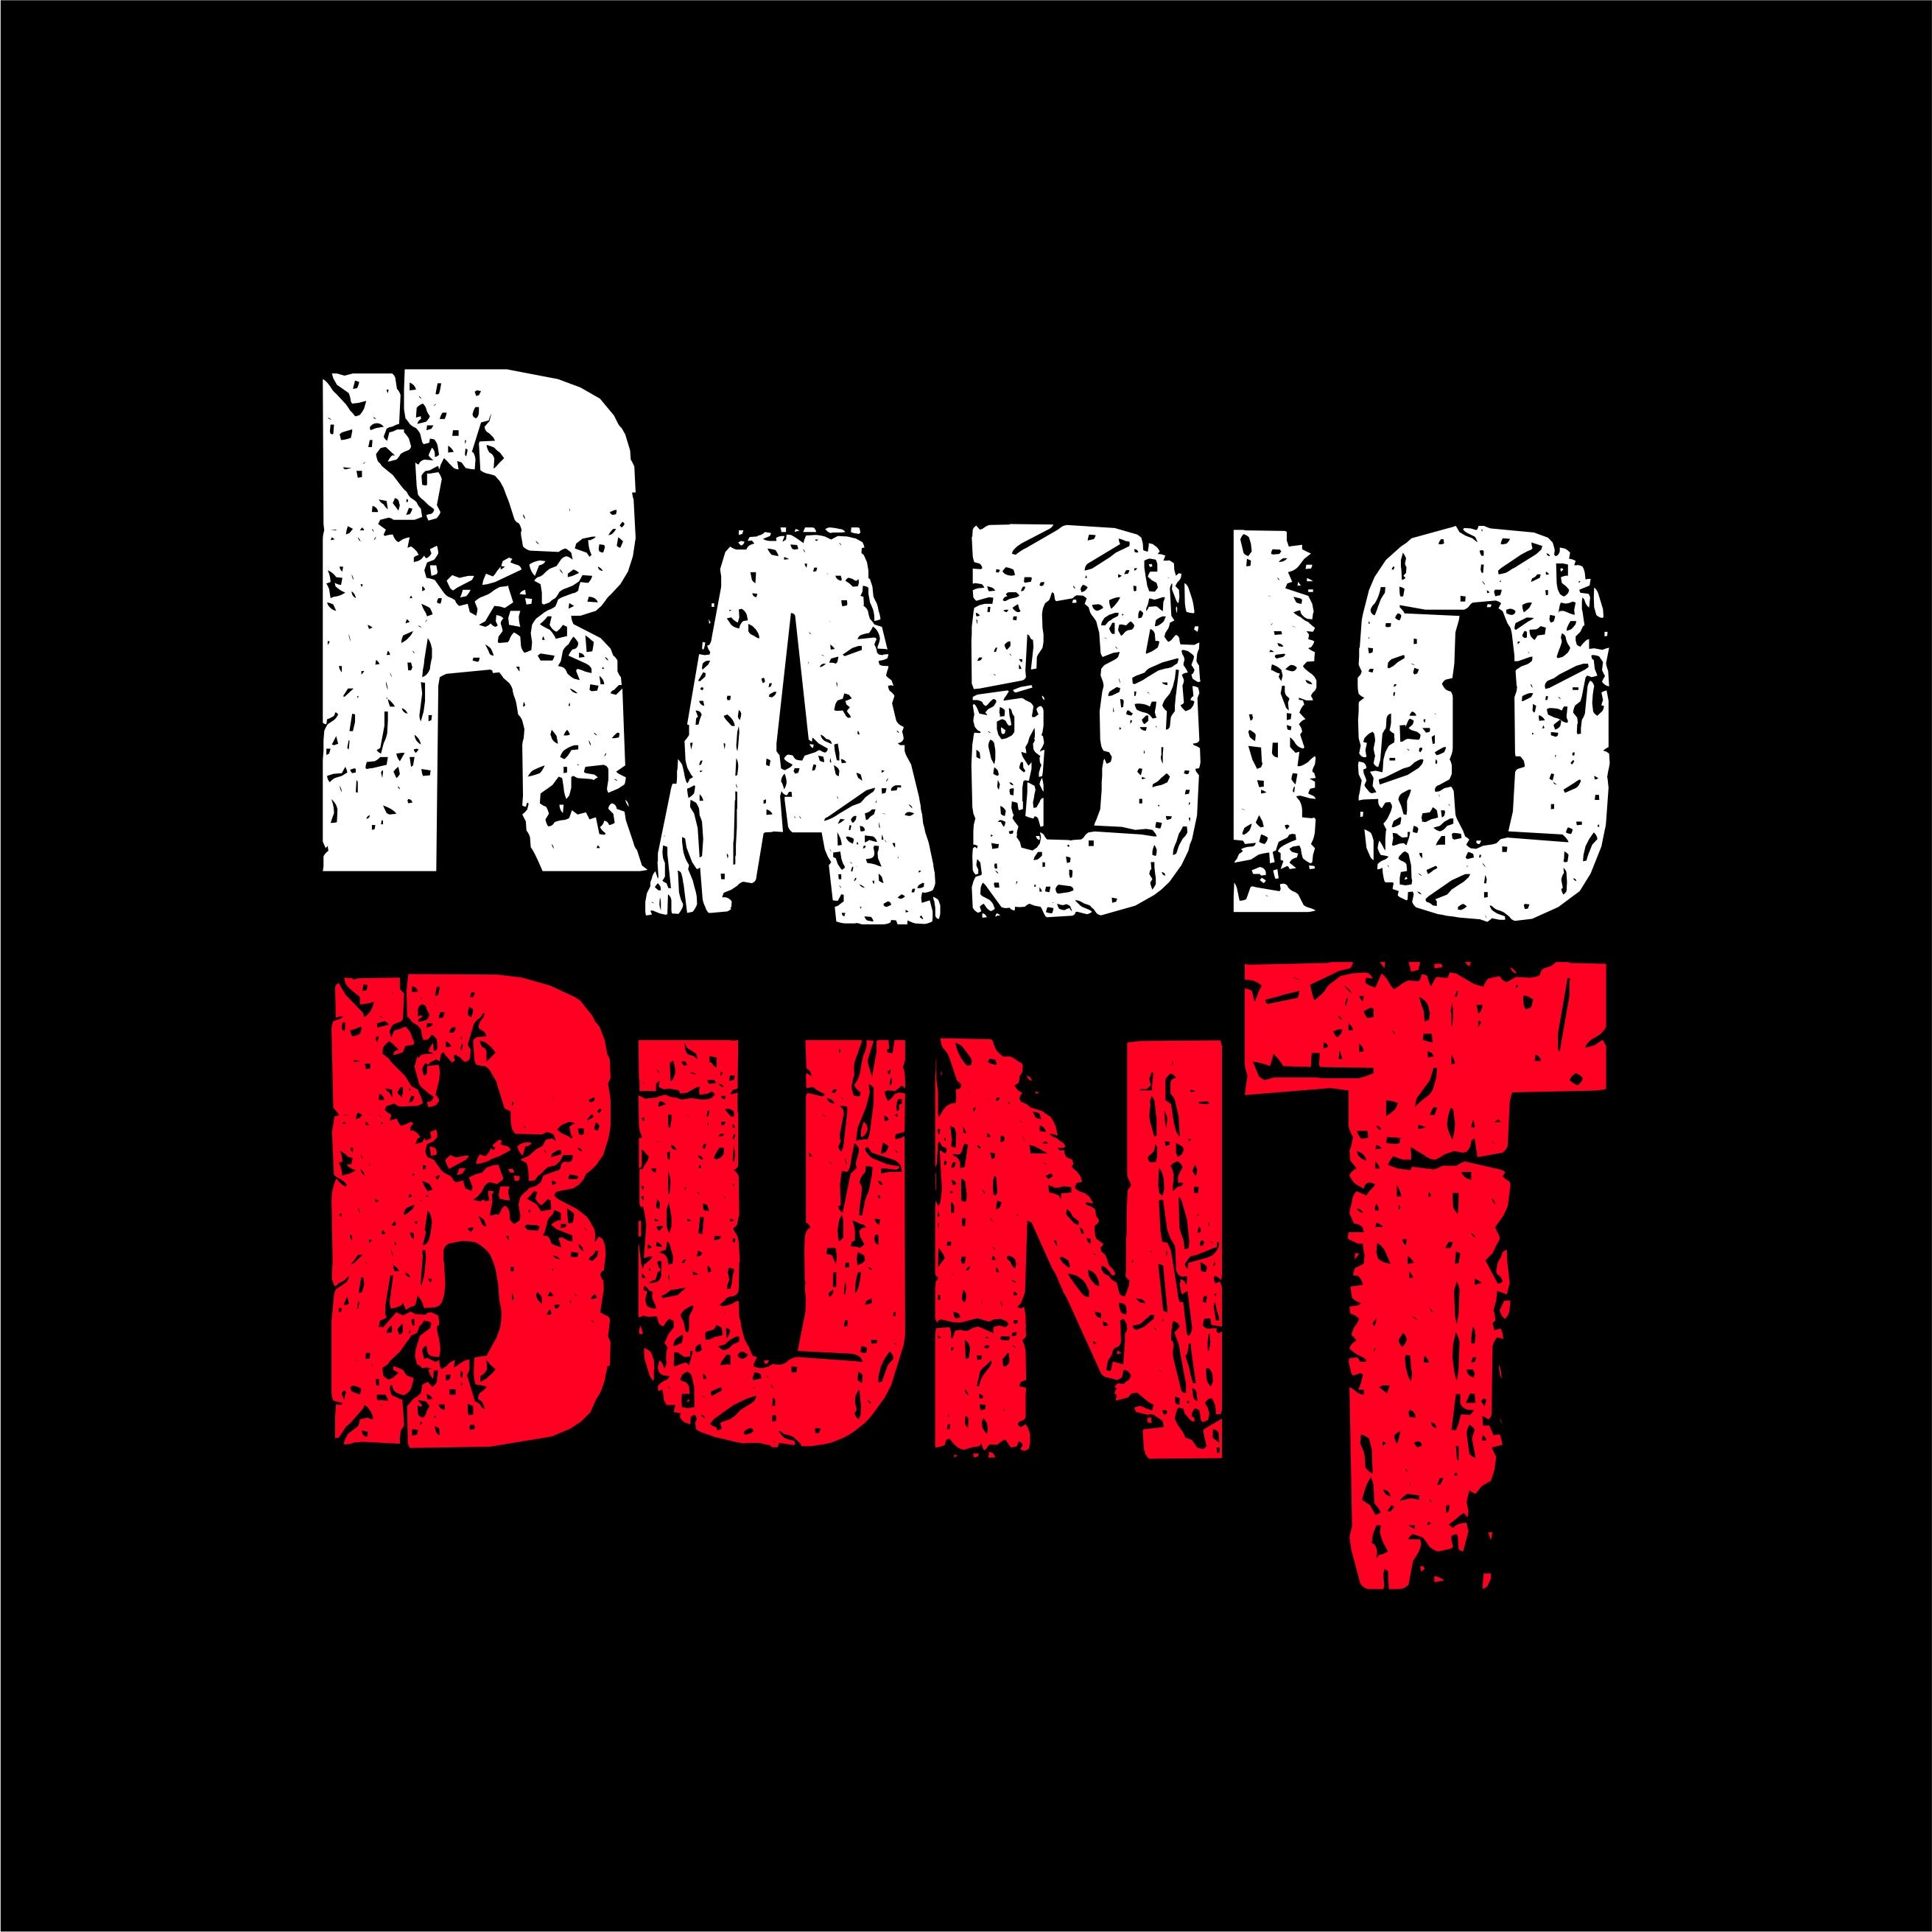 Radio Bunt shout.ca